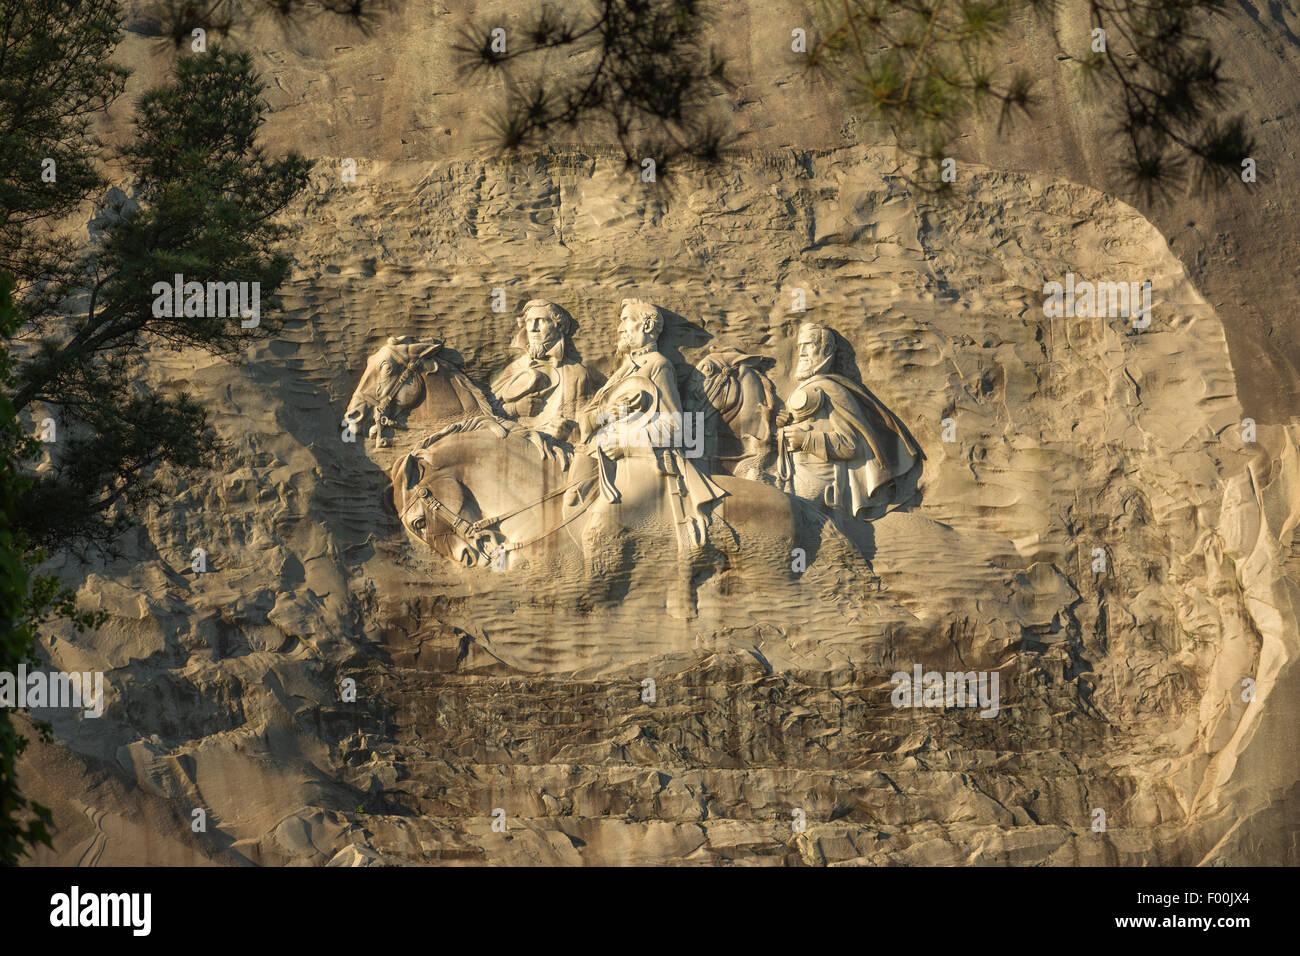 Bas relief carving of confederate american civil war